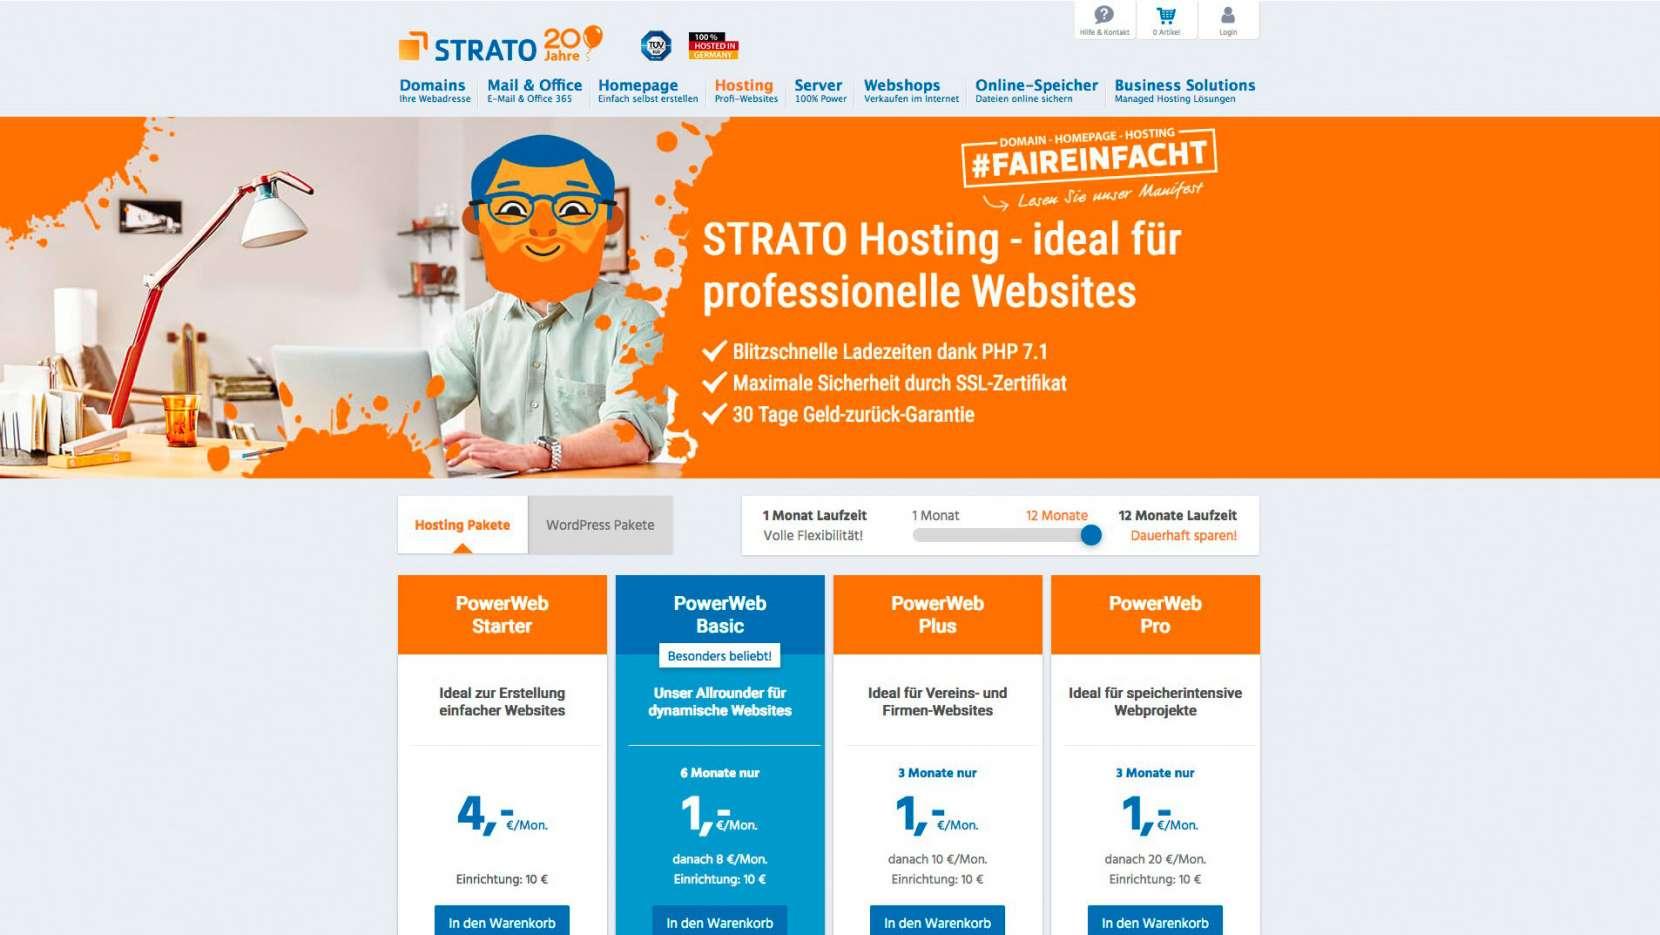 strato-03-1660x935.jpg